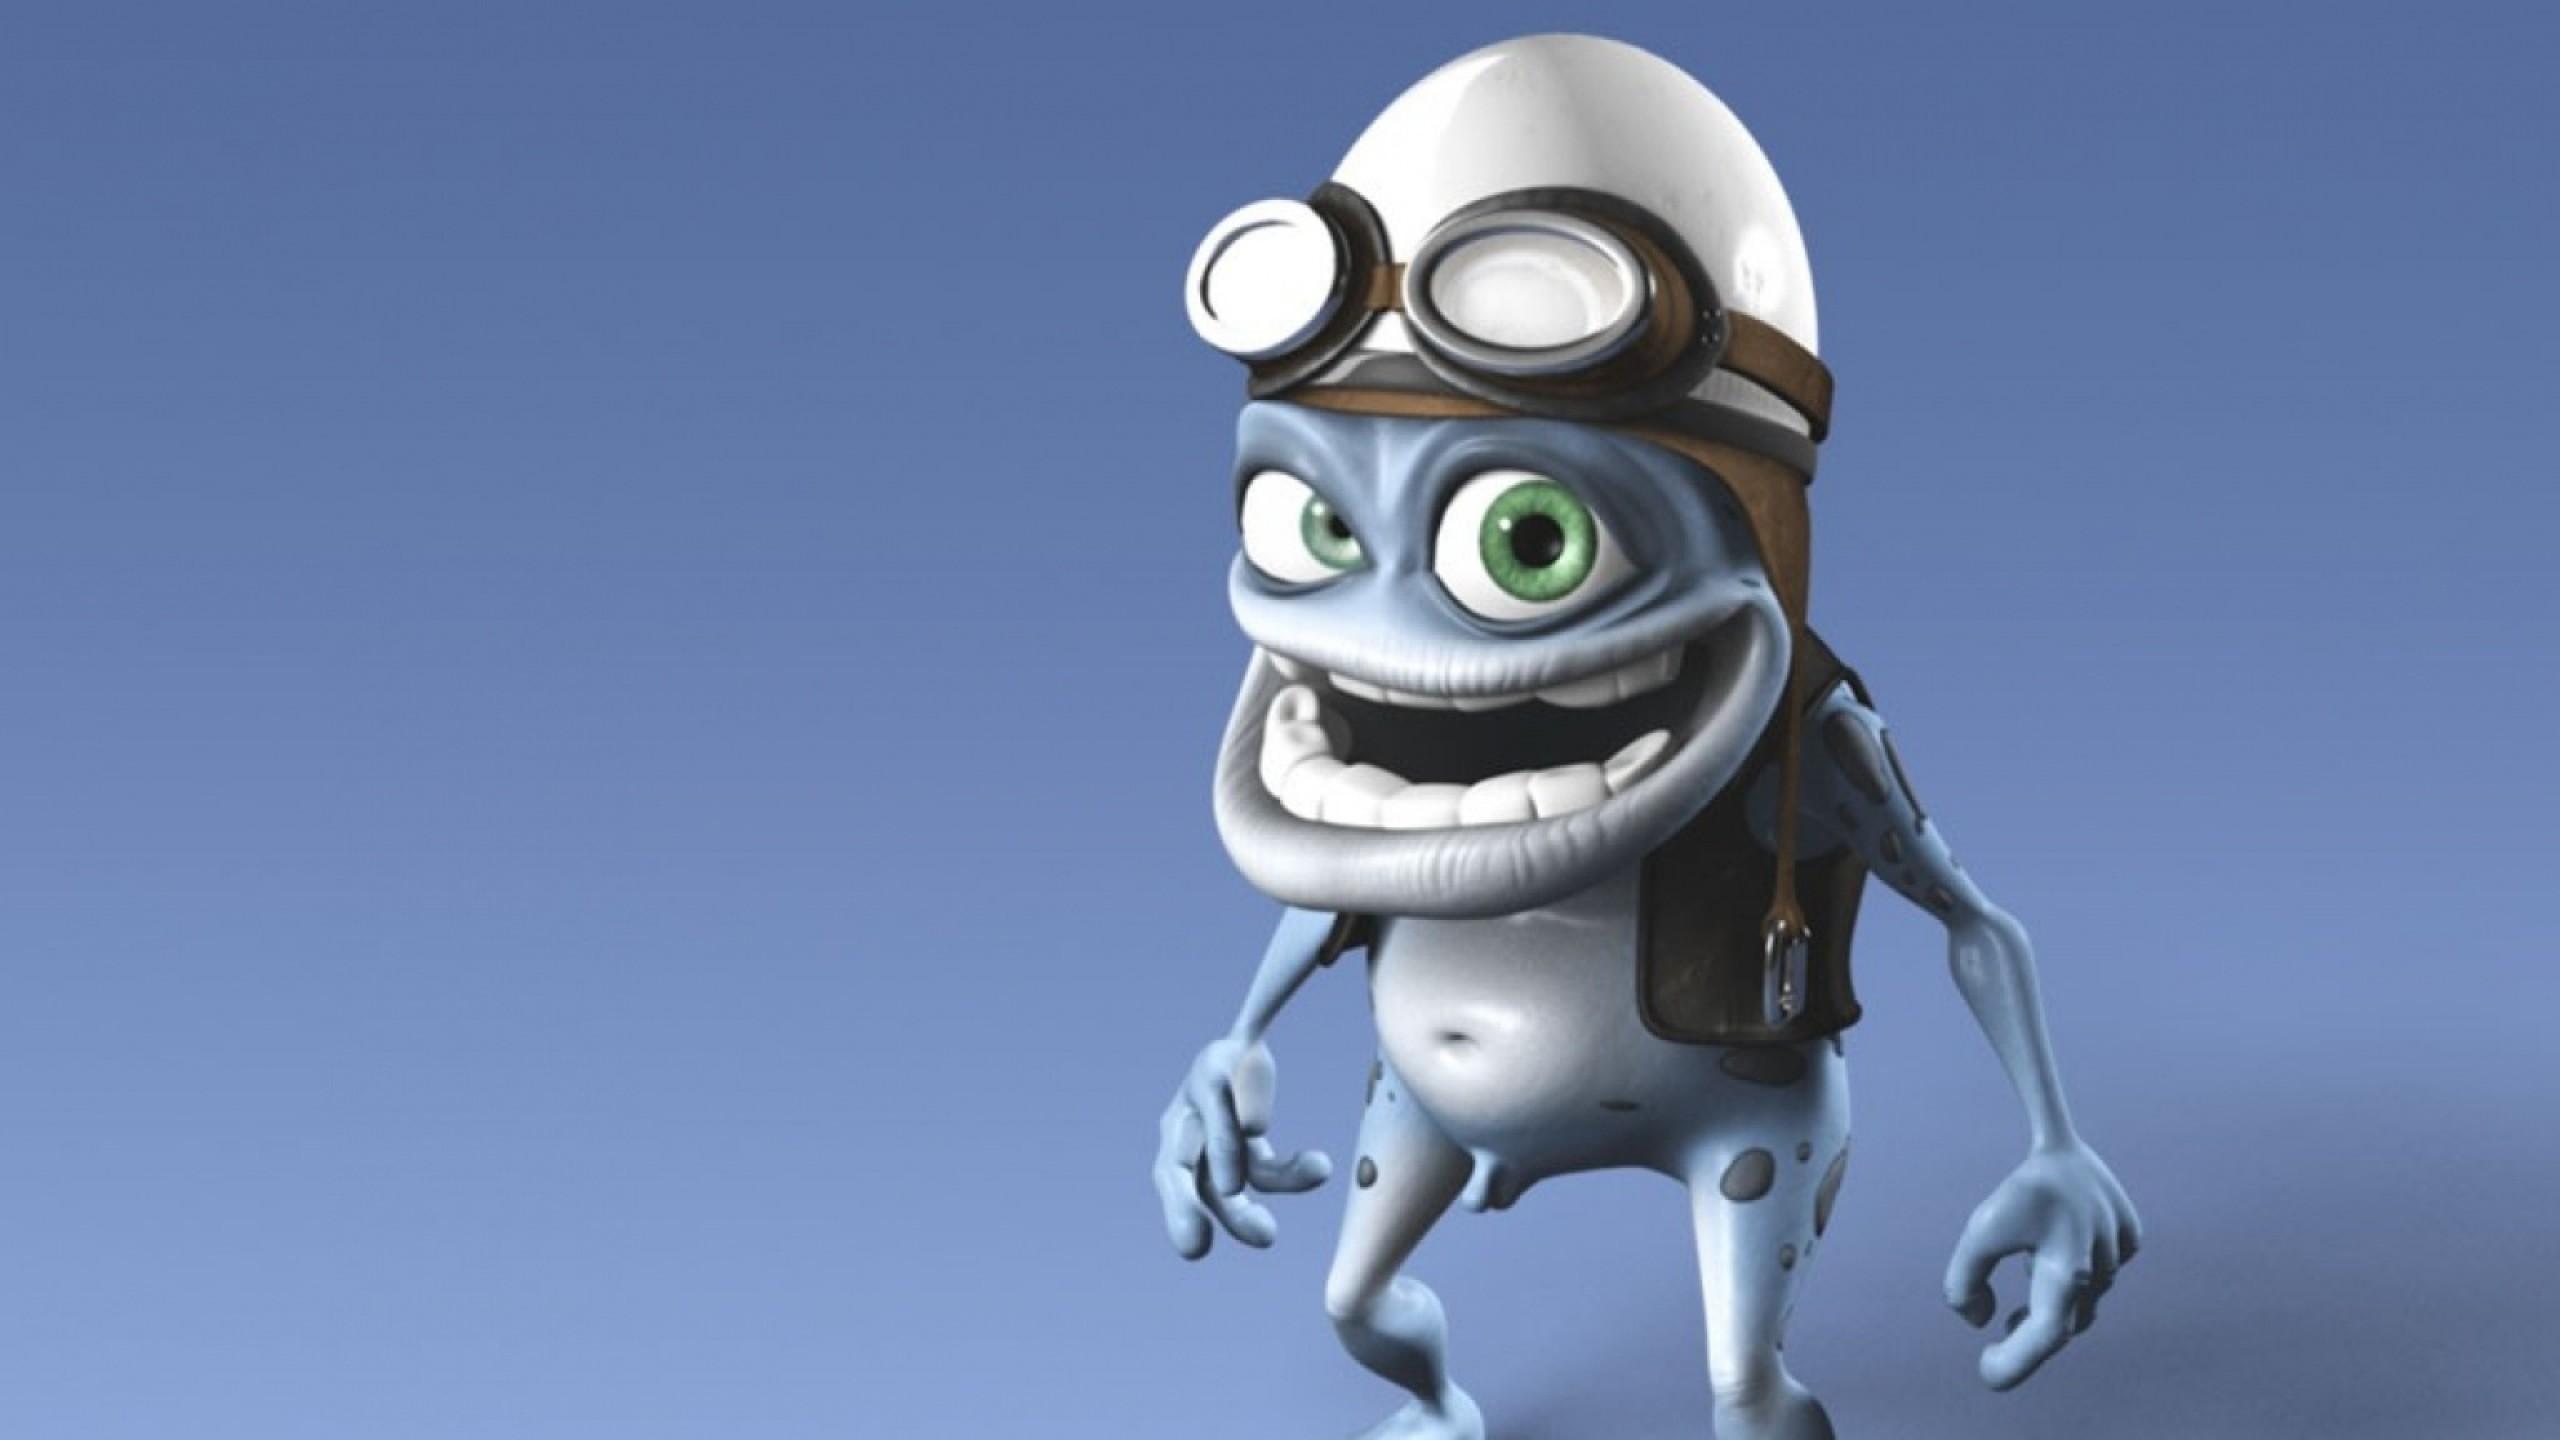 Wallpaper crazy frog, image, cap, smile, eyes